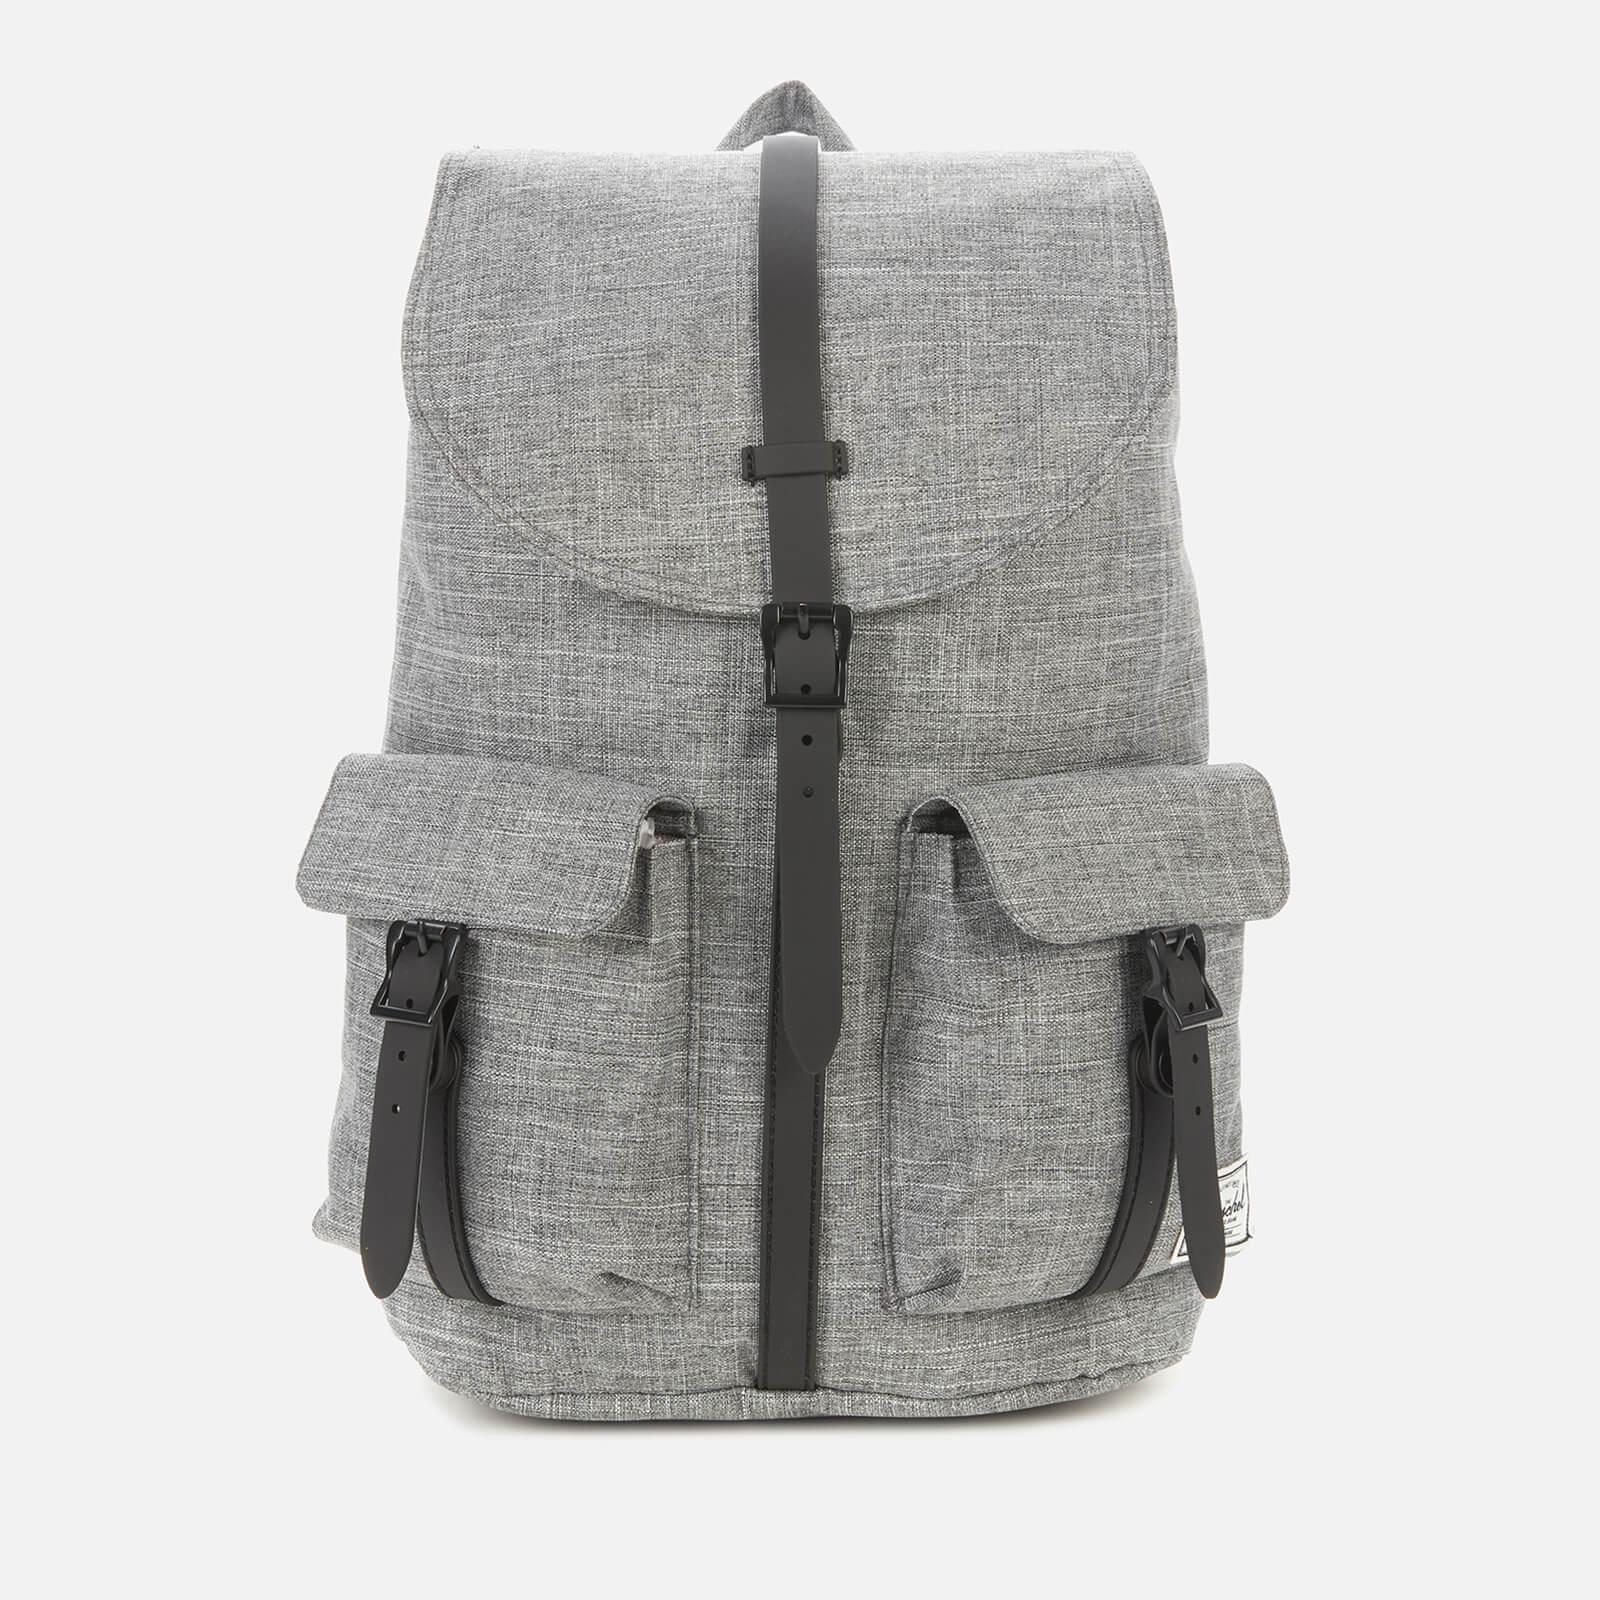 Herschel Supply Co. Men's Dawson Backpack - Raven Crosshatch/Black